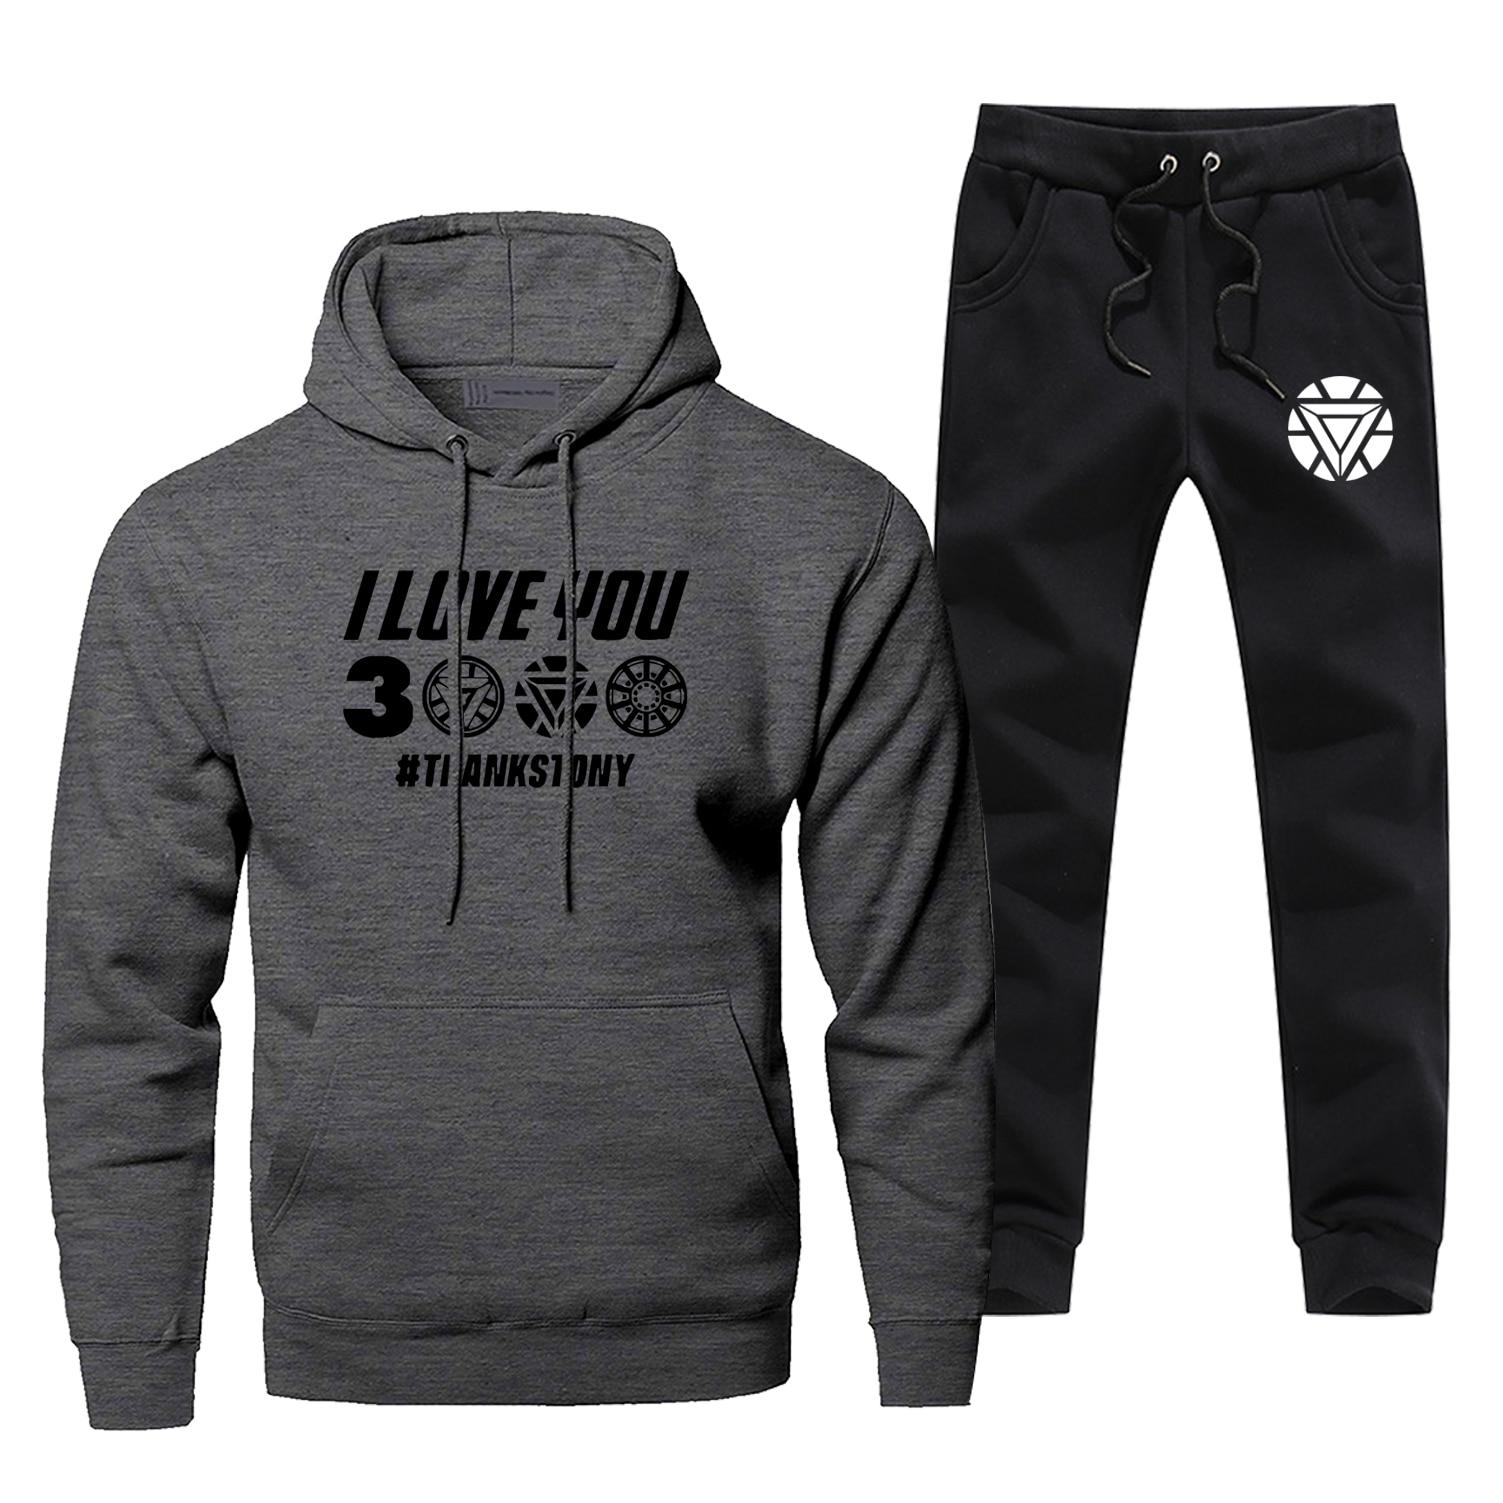 Iron Man Hoodies Pants Casual Fashion I Love You 3000 Men's Sets Fitness Gym Suit Black Gray Warm Tony Stark Pants Sweatshirts